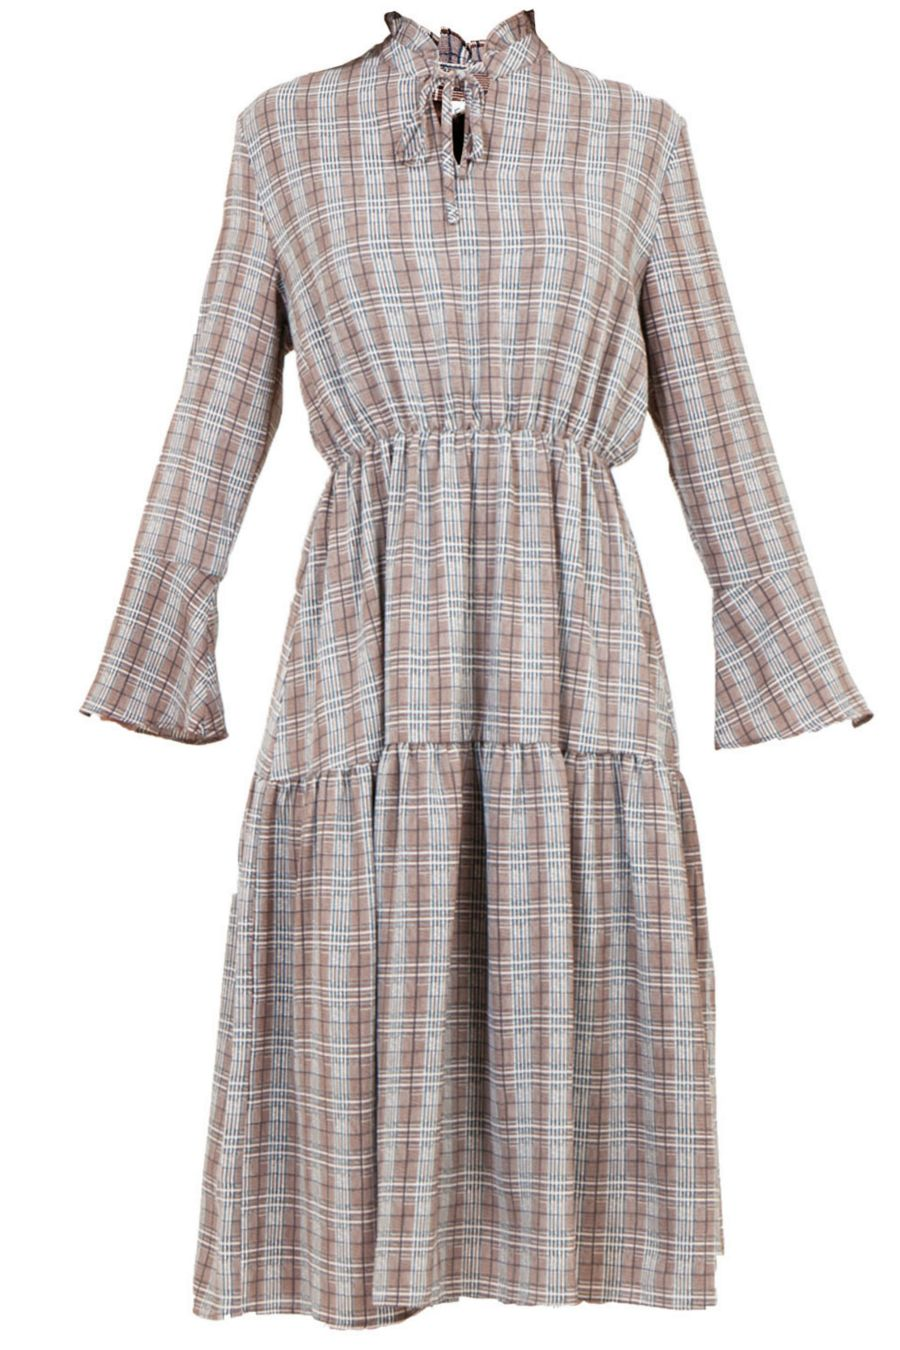 le-mimosa-brown-plaid-midi-dress-1